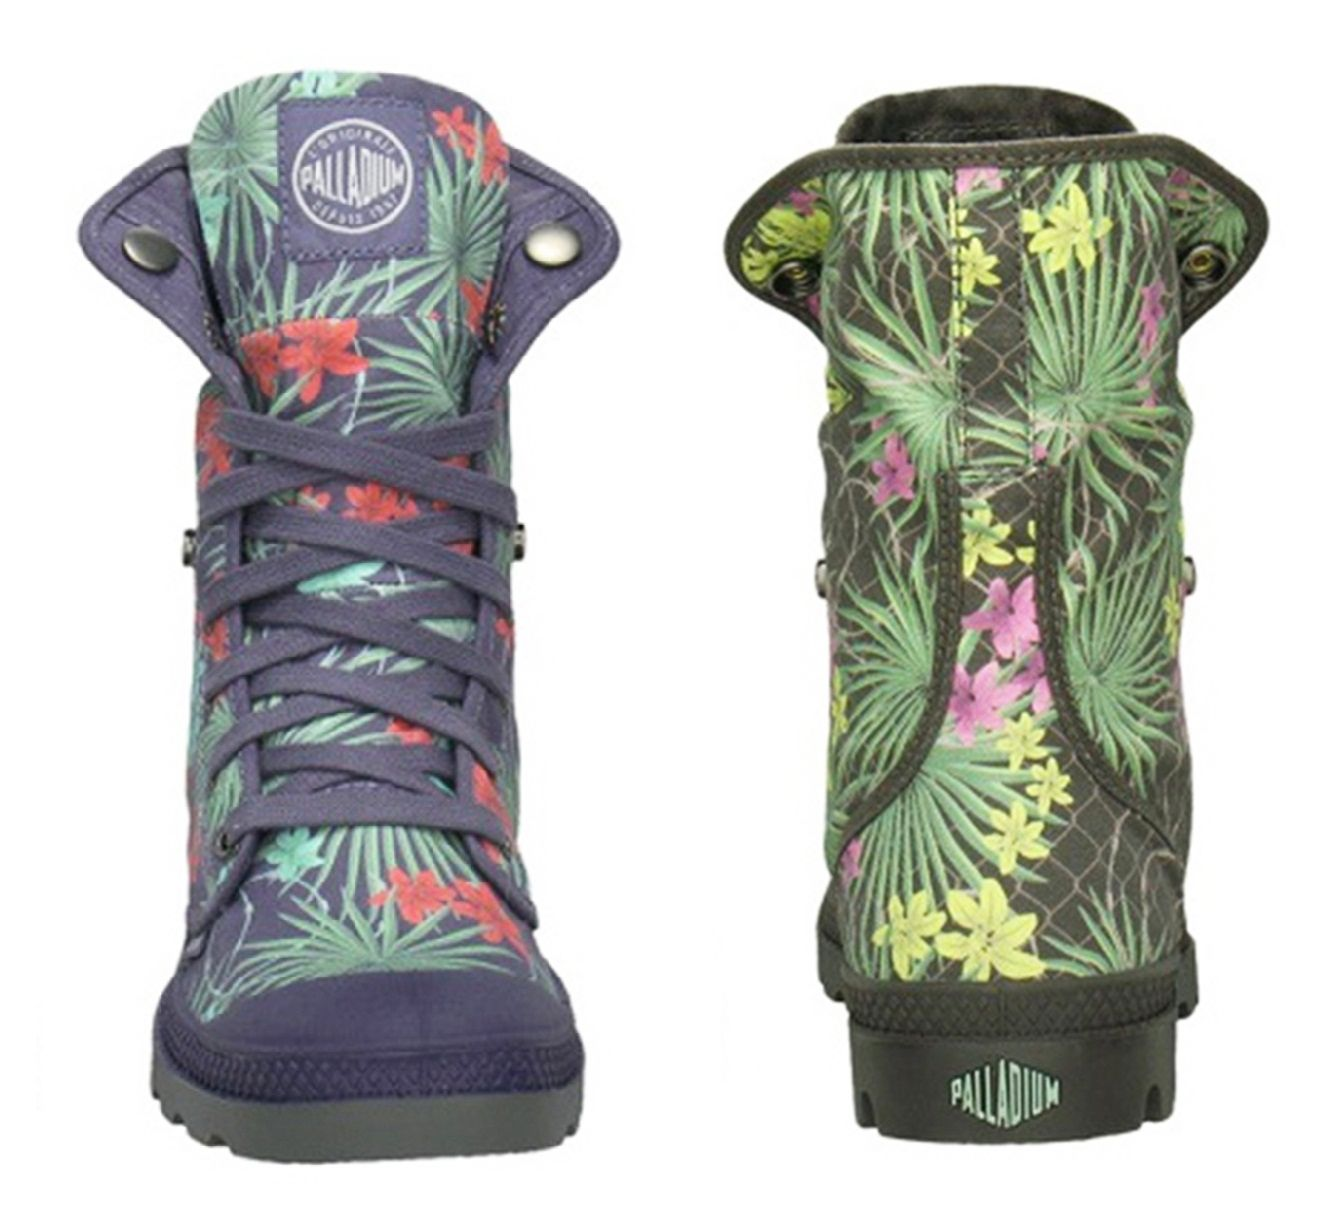 By Gitmo Pattern jv Tropical Camo Boots Palladium Commission aRqwE5Rf